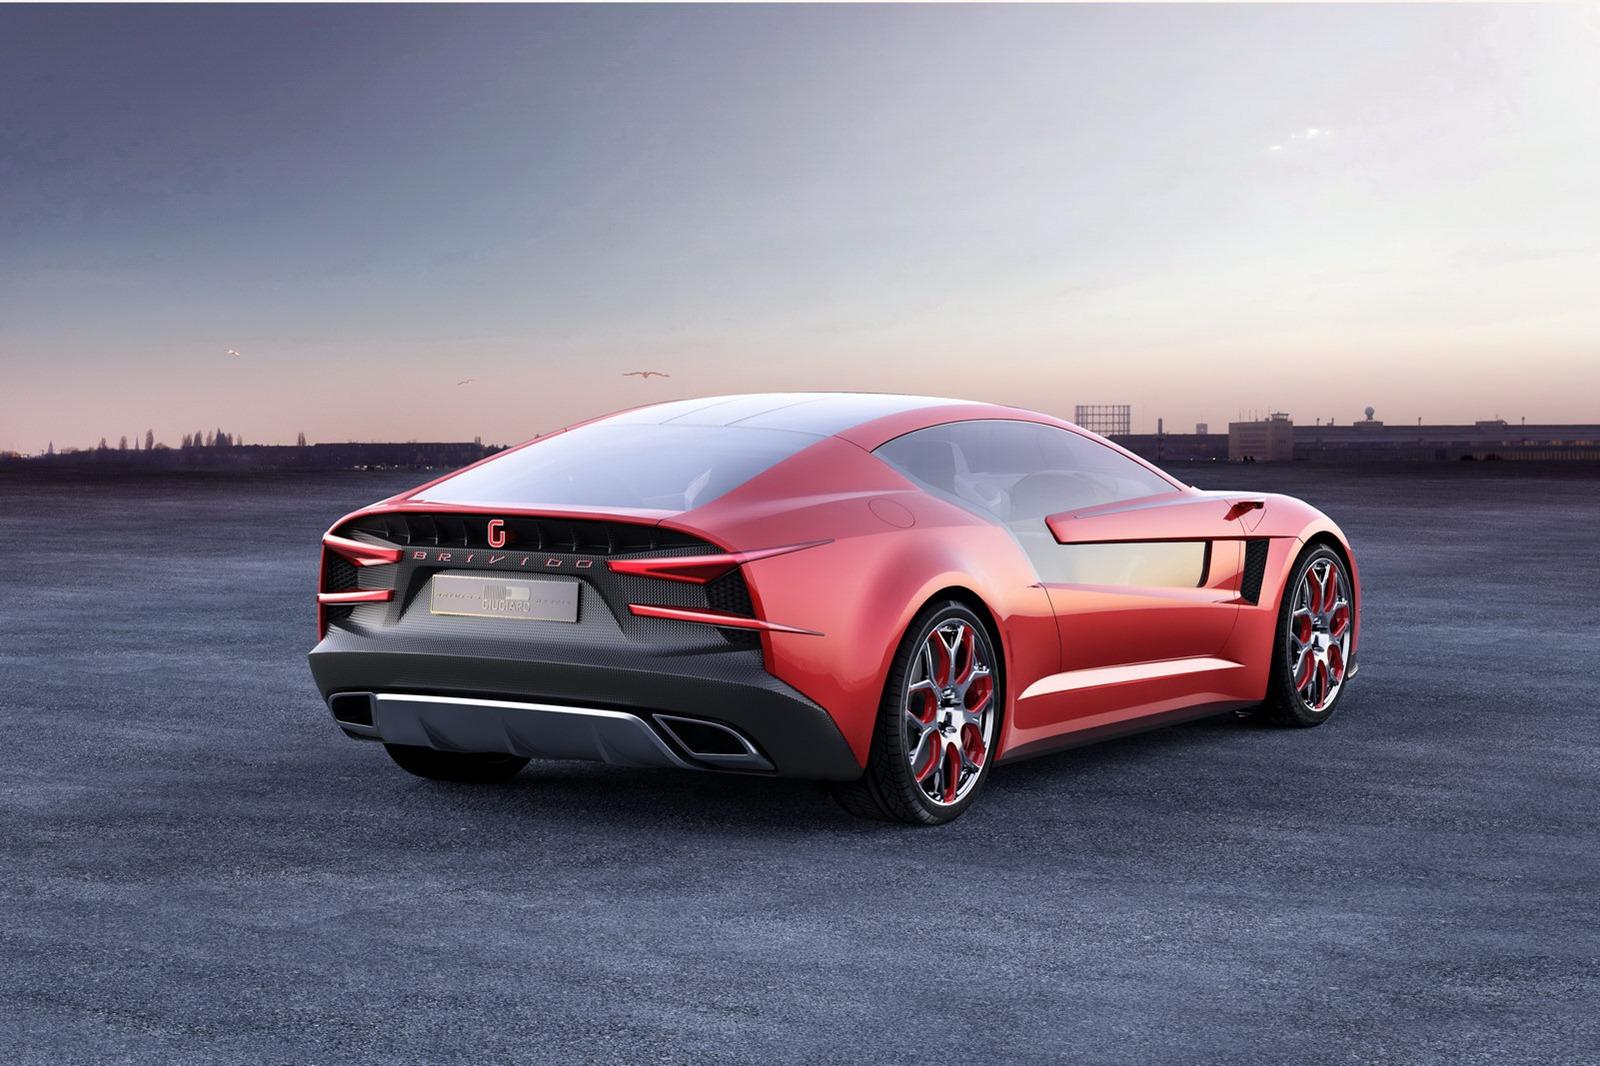 8 Seater Cars >> 2012 Italdesign Giugiaro Brivido Concept Revealed [Photo ...